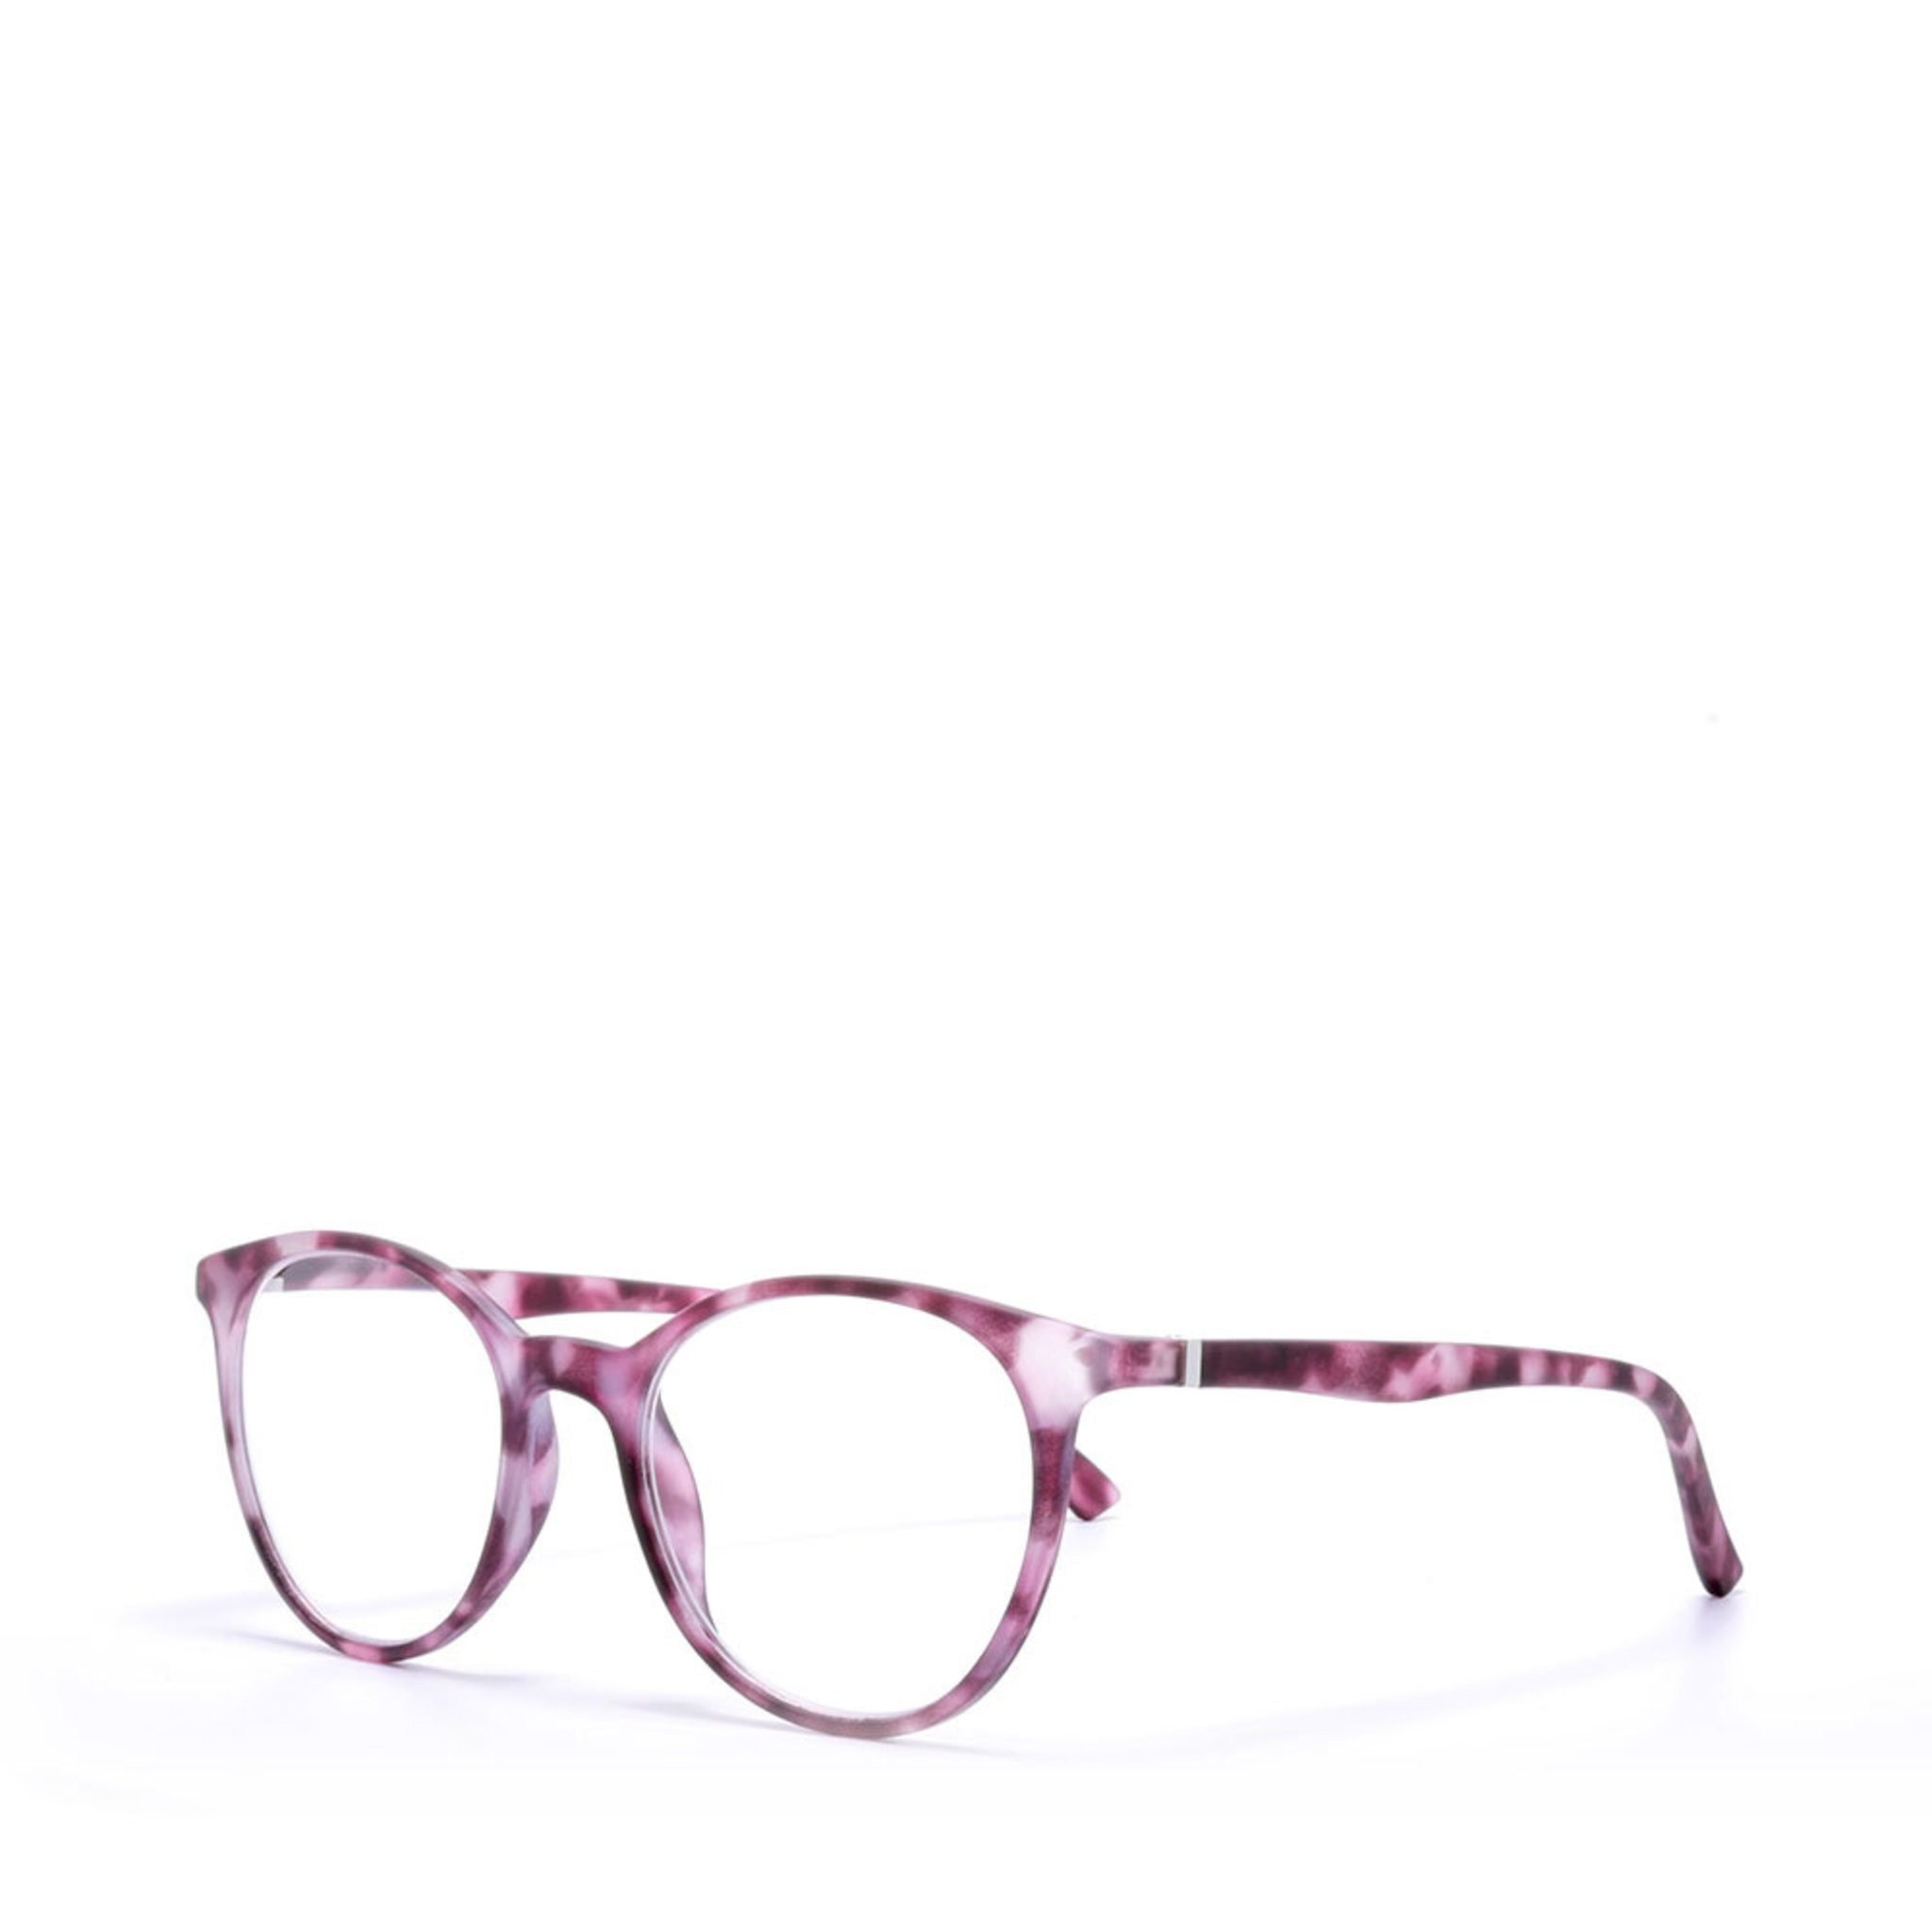 Demi Pink Reading Glasses, +1